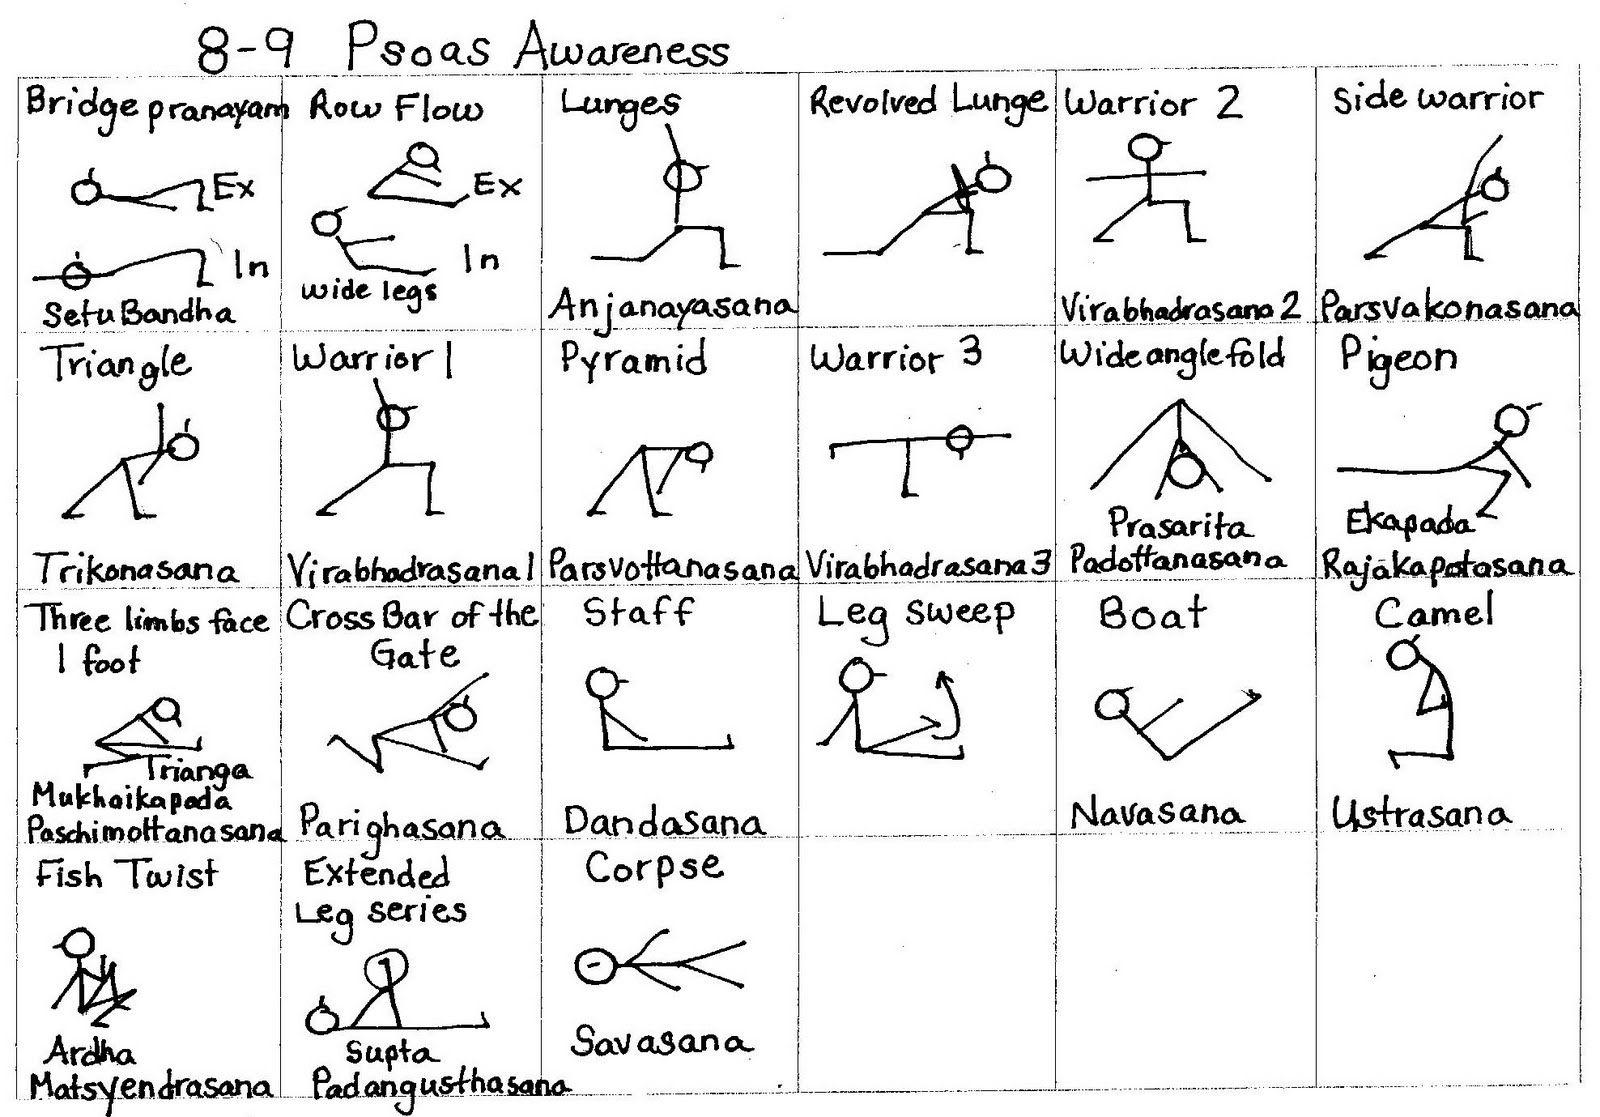 Iliopsoas Strengthening Exercises